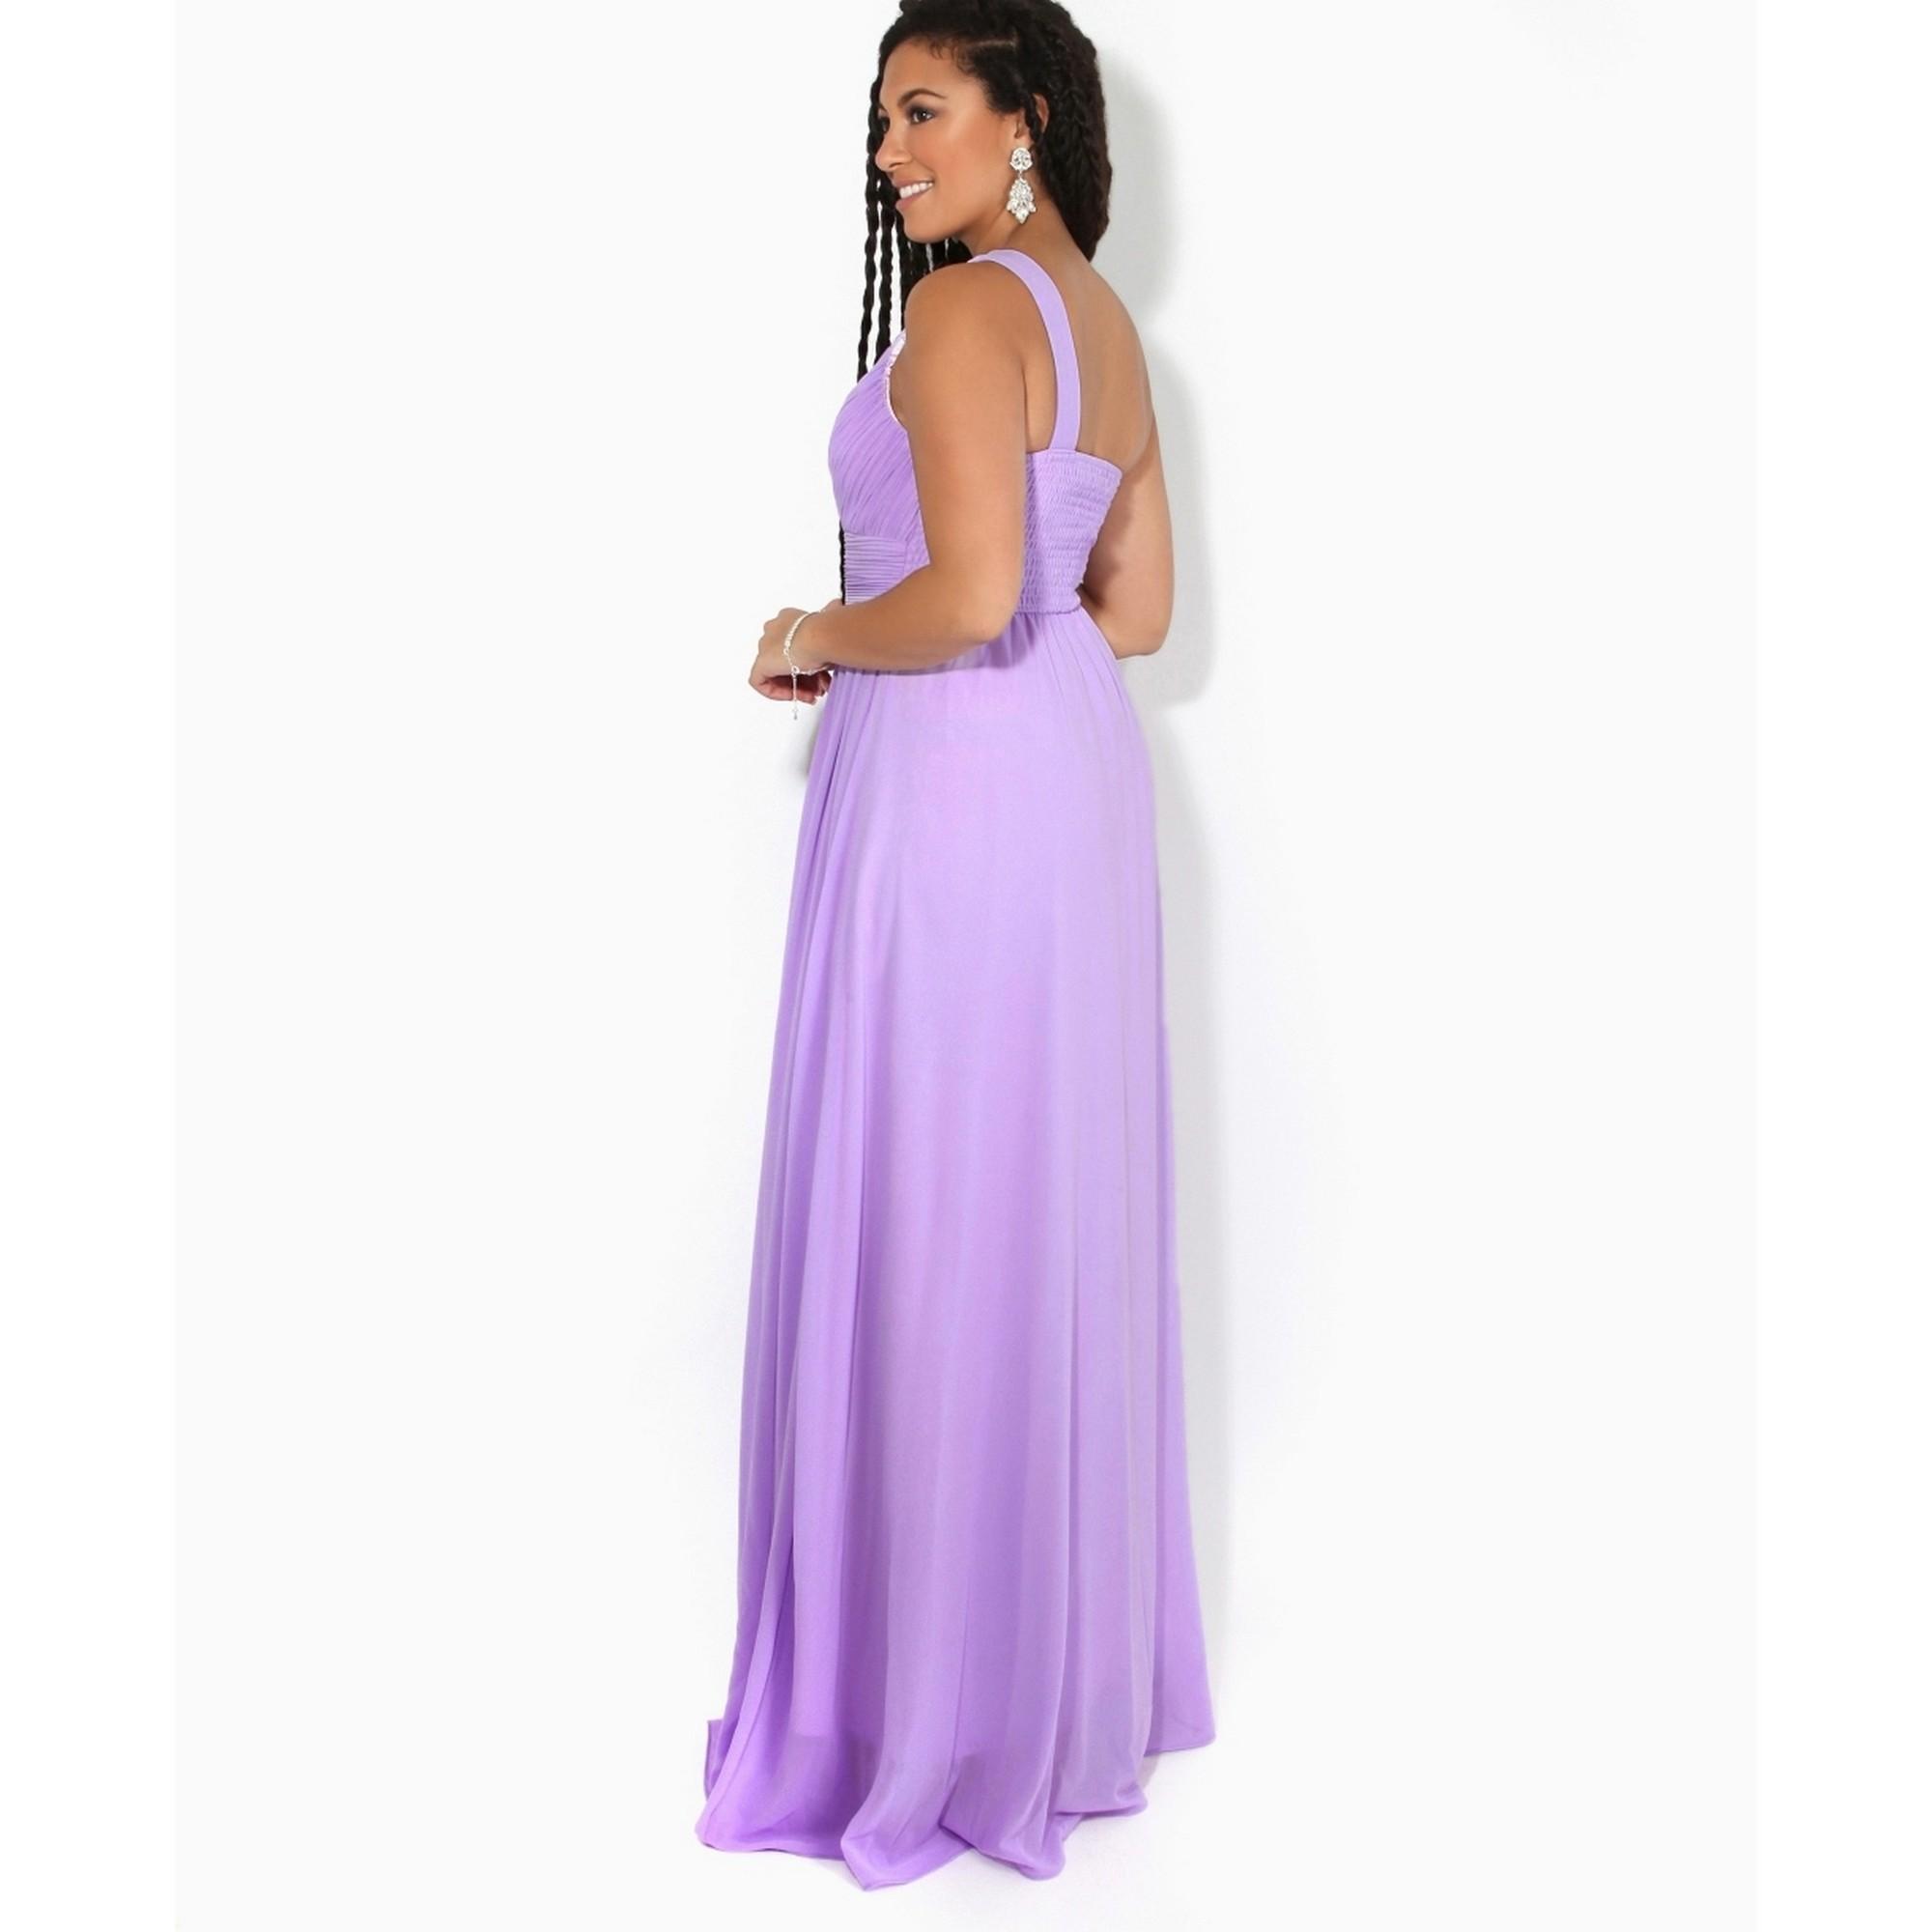 Krisp Womens/Ladies One Shoulder Evening Maxi Dress (12 UK) (Aubergine Purple)